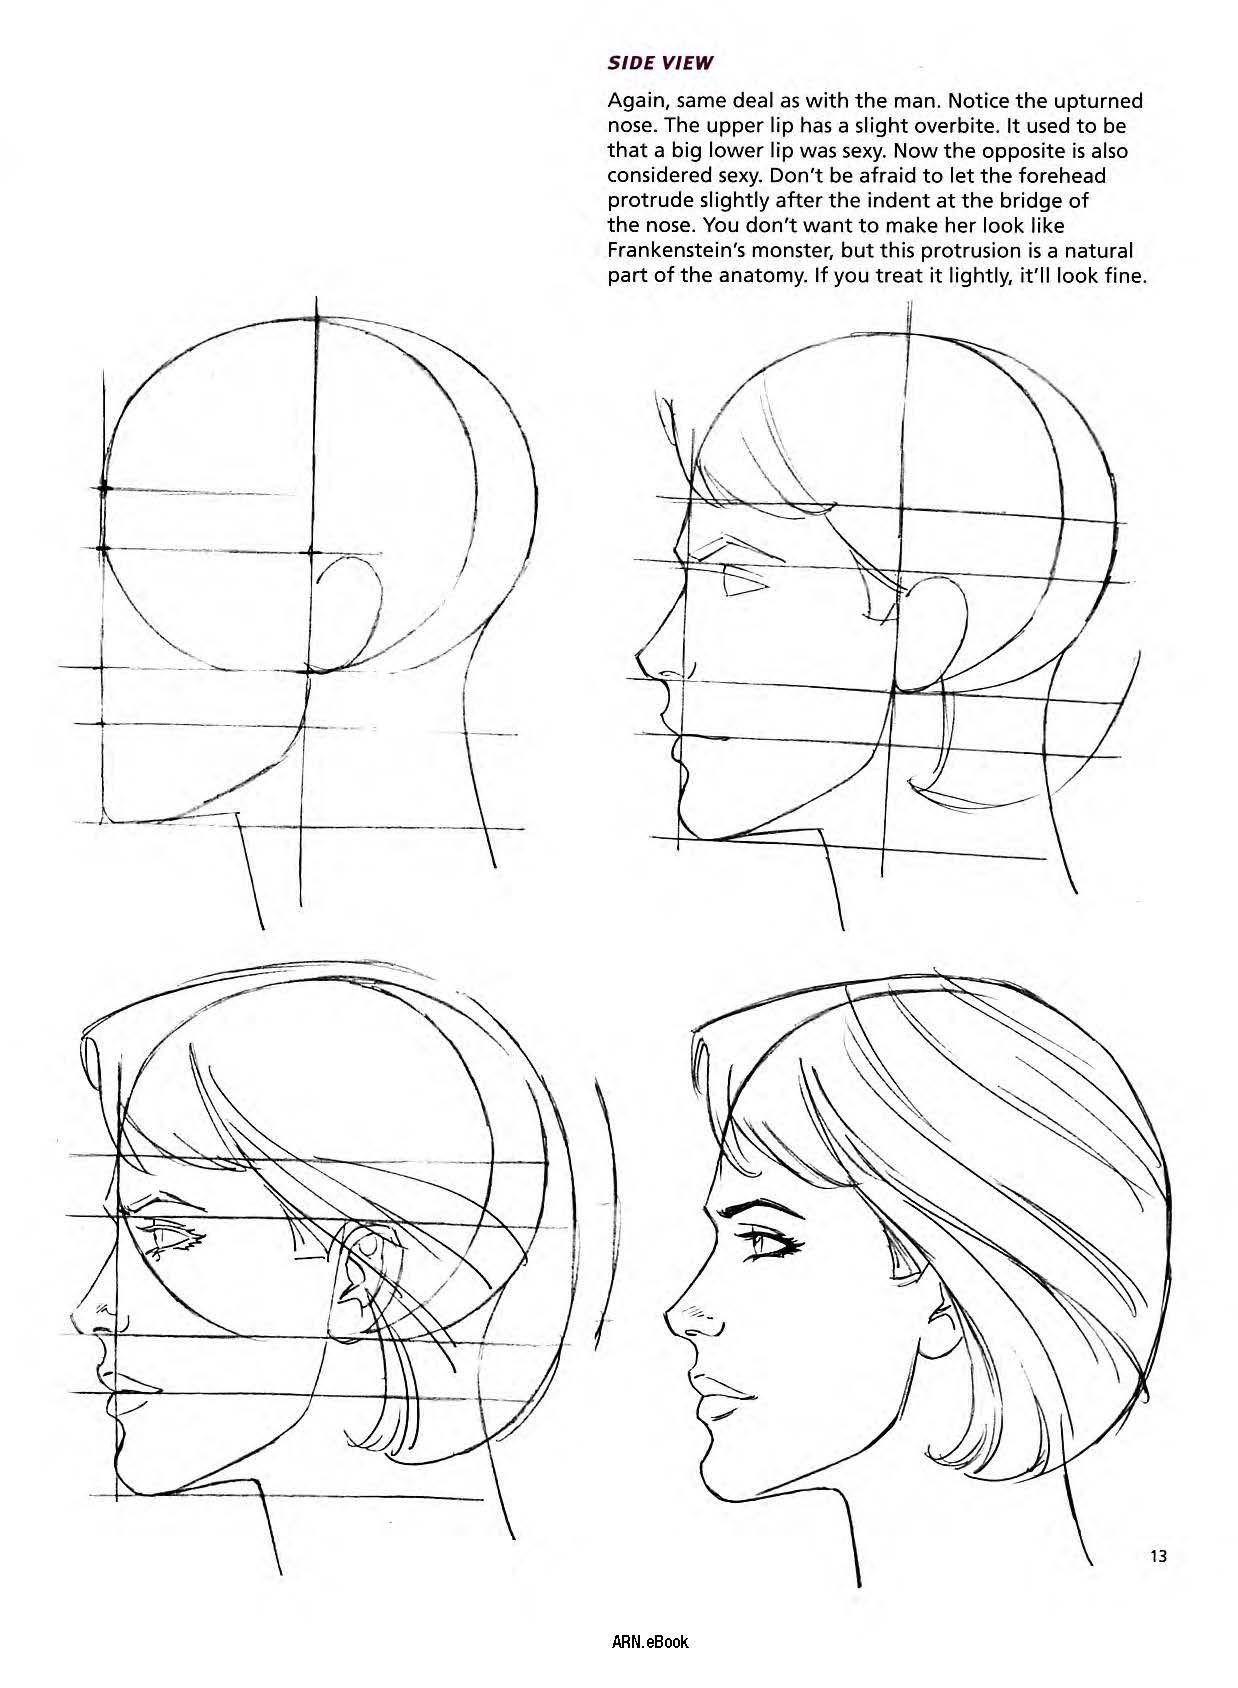 Christopher Hart | Book drawing, Drawings, Anatomy art